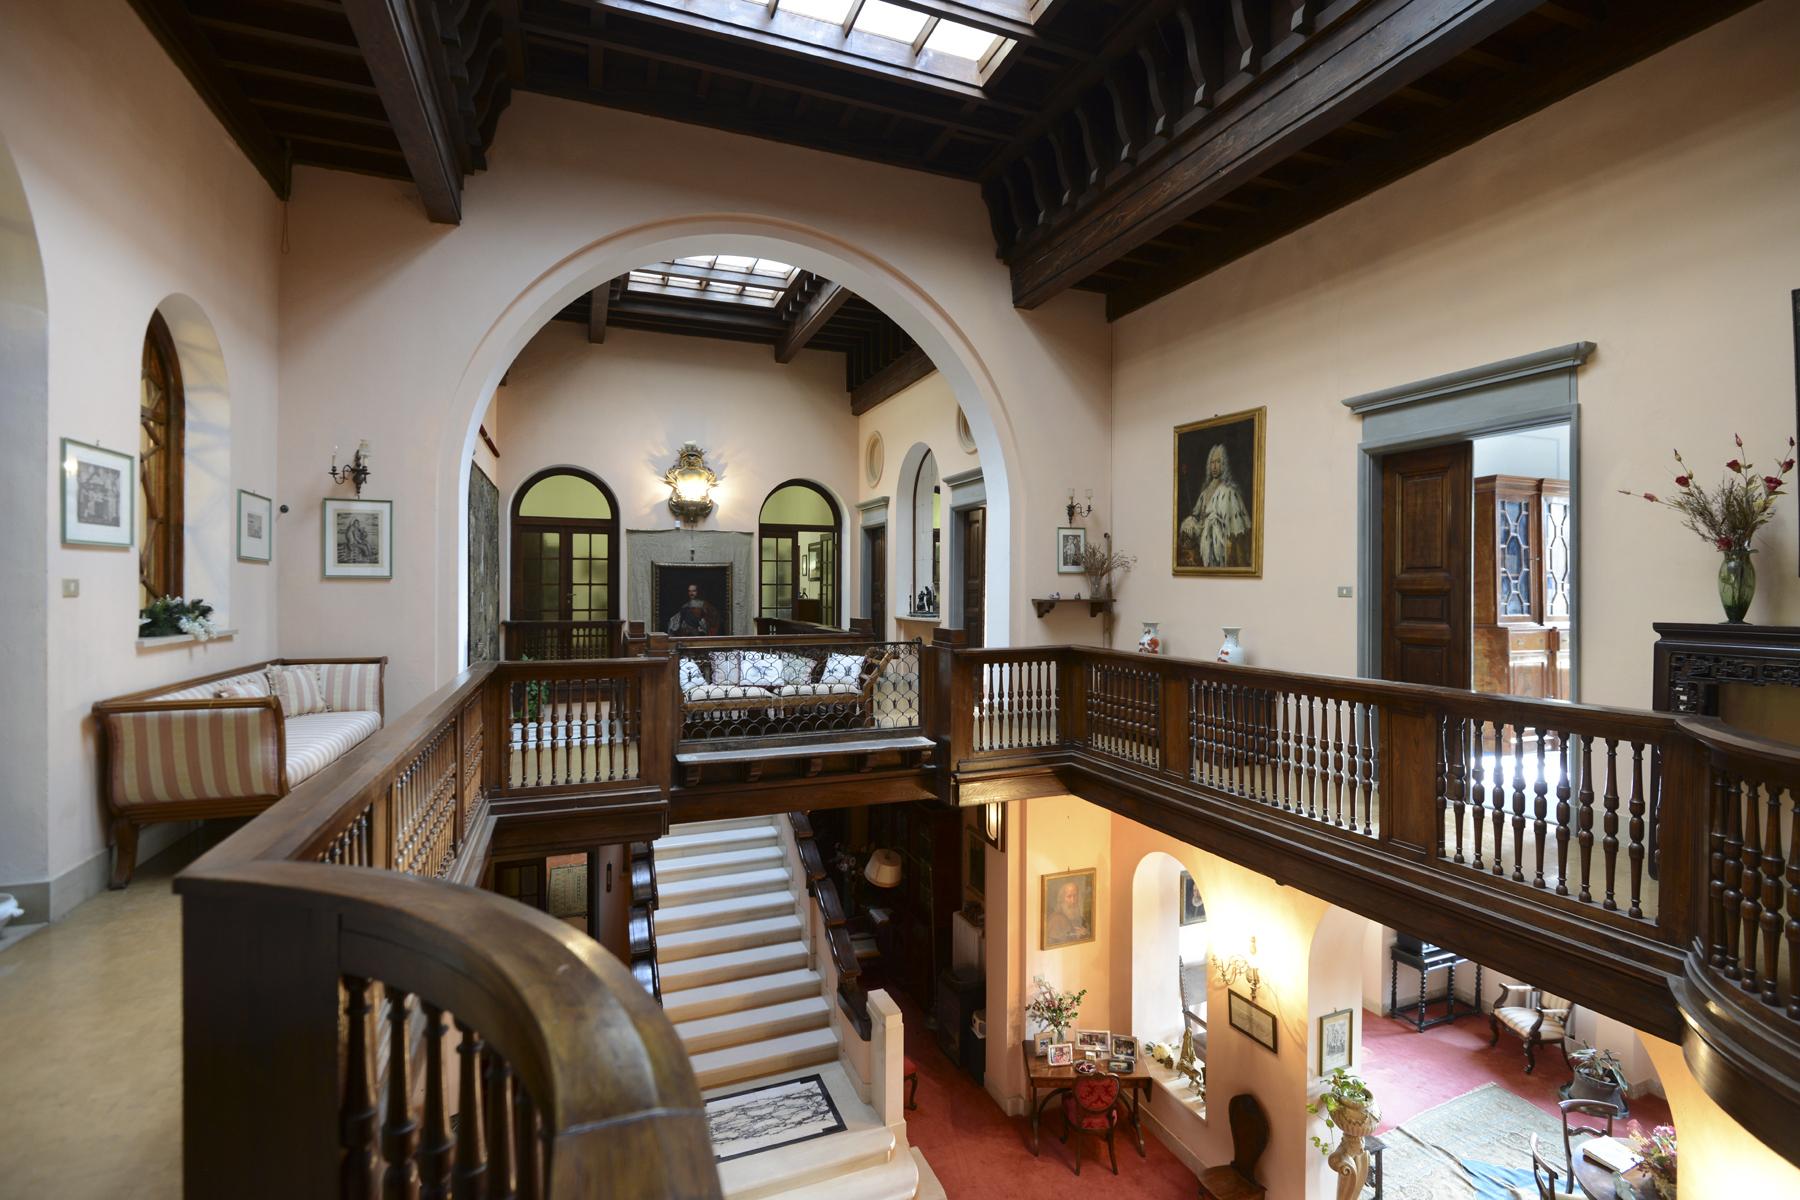 Villa in Vendita a Casciana Terme Lari: 5 locali, 1800 mq - Foto 20